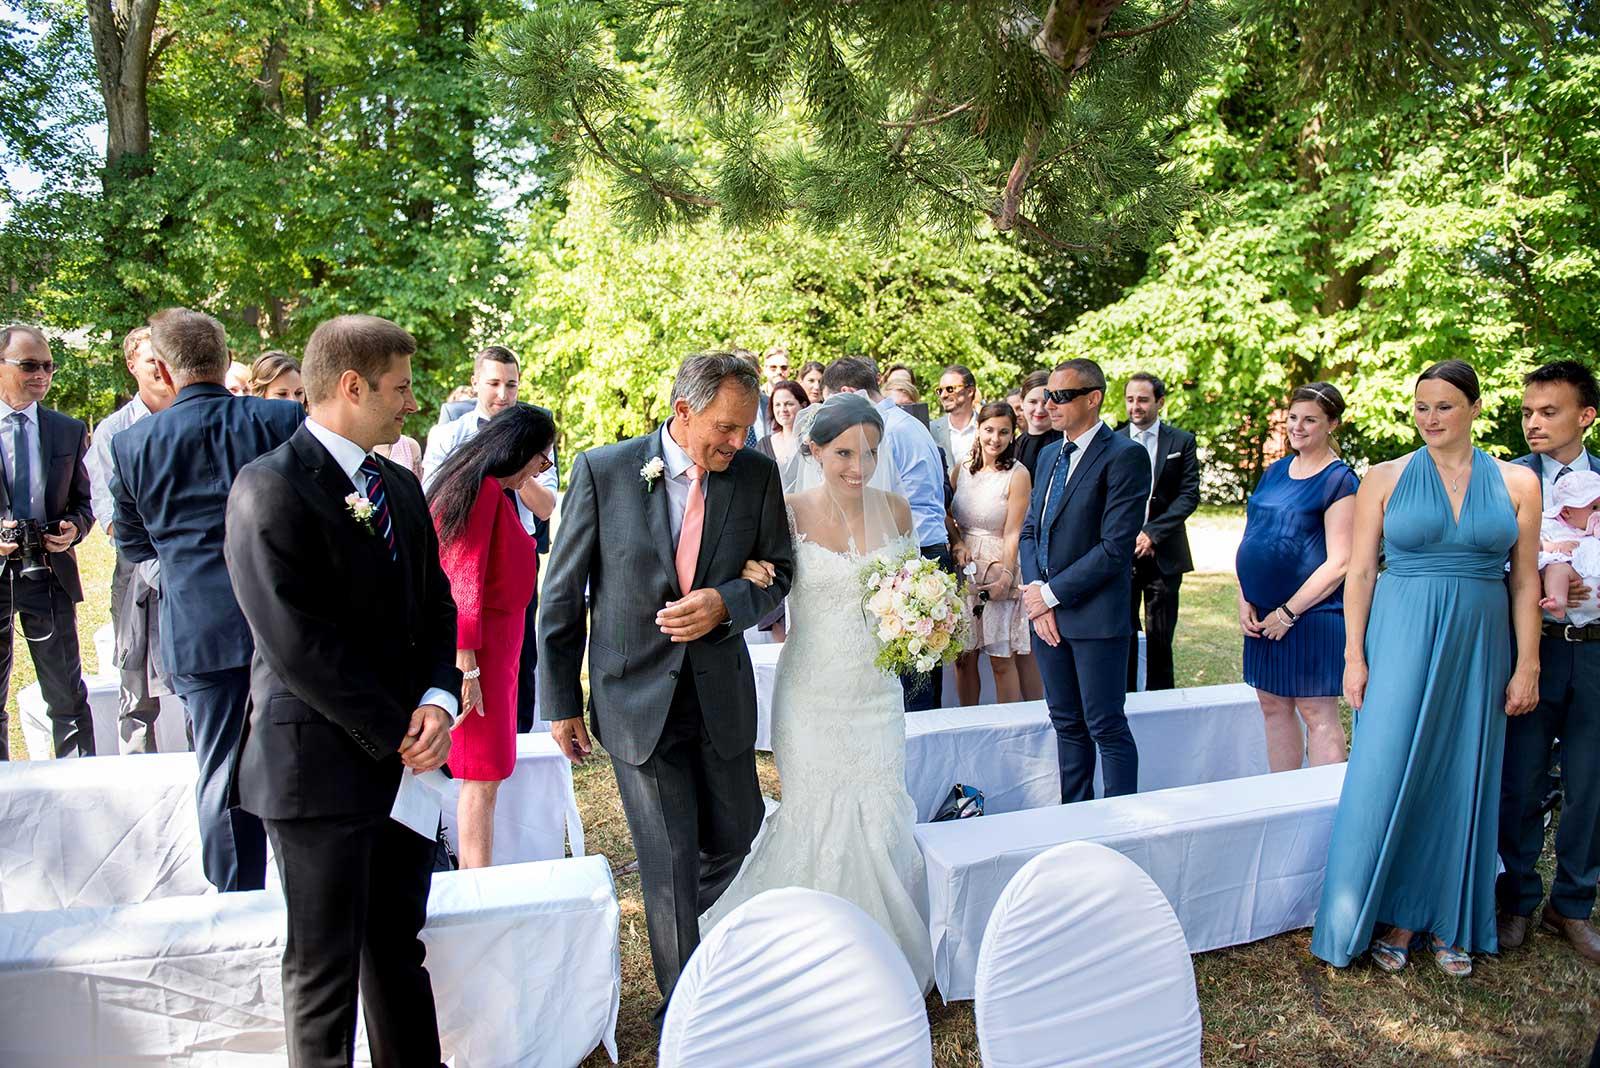 17 svatebni foto svatebni obrad svatebni fotograf ales motejl jihocesky kraj